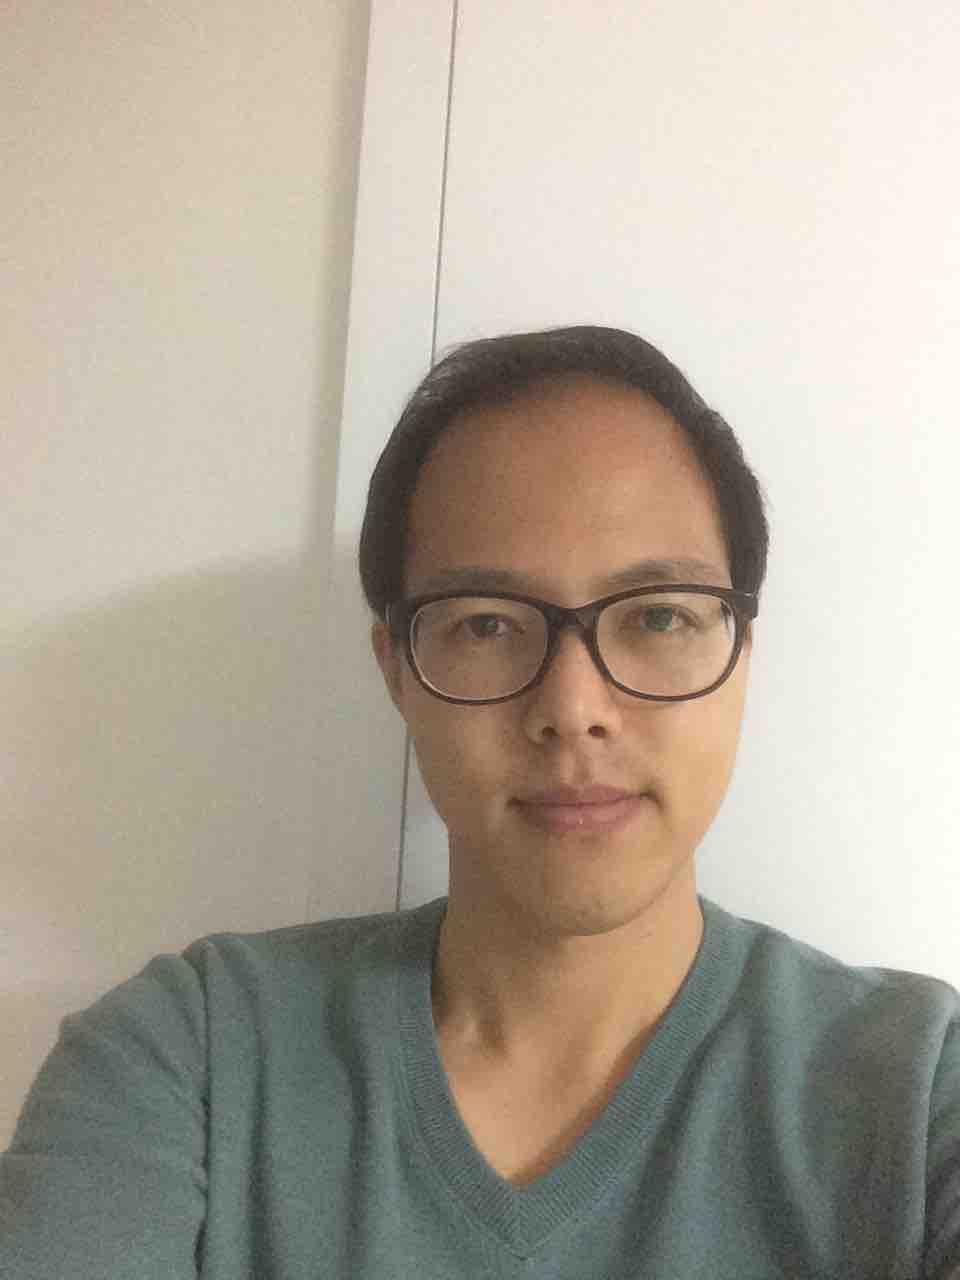 Kyu Jang